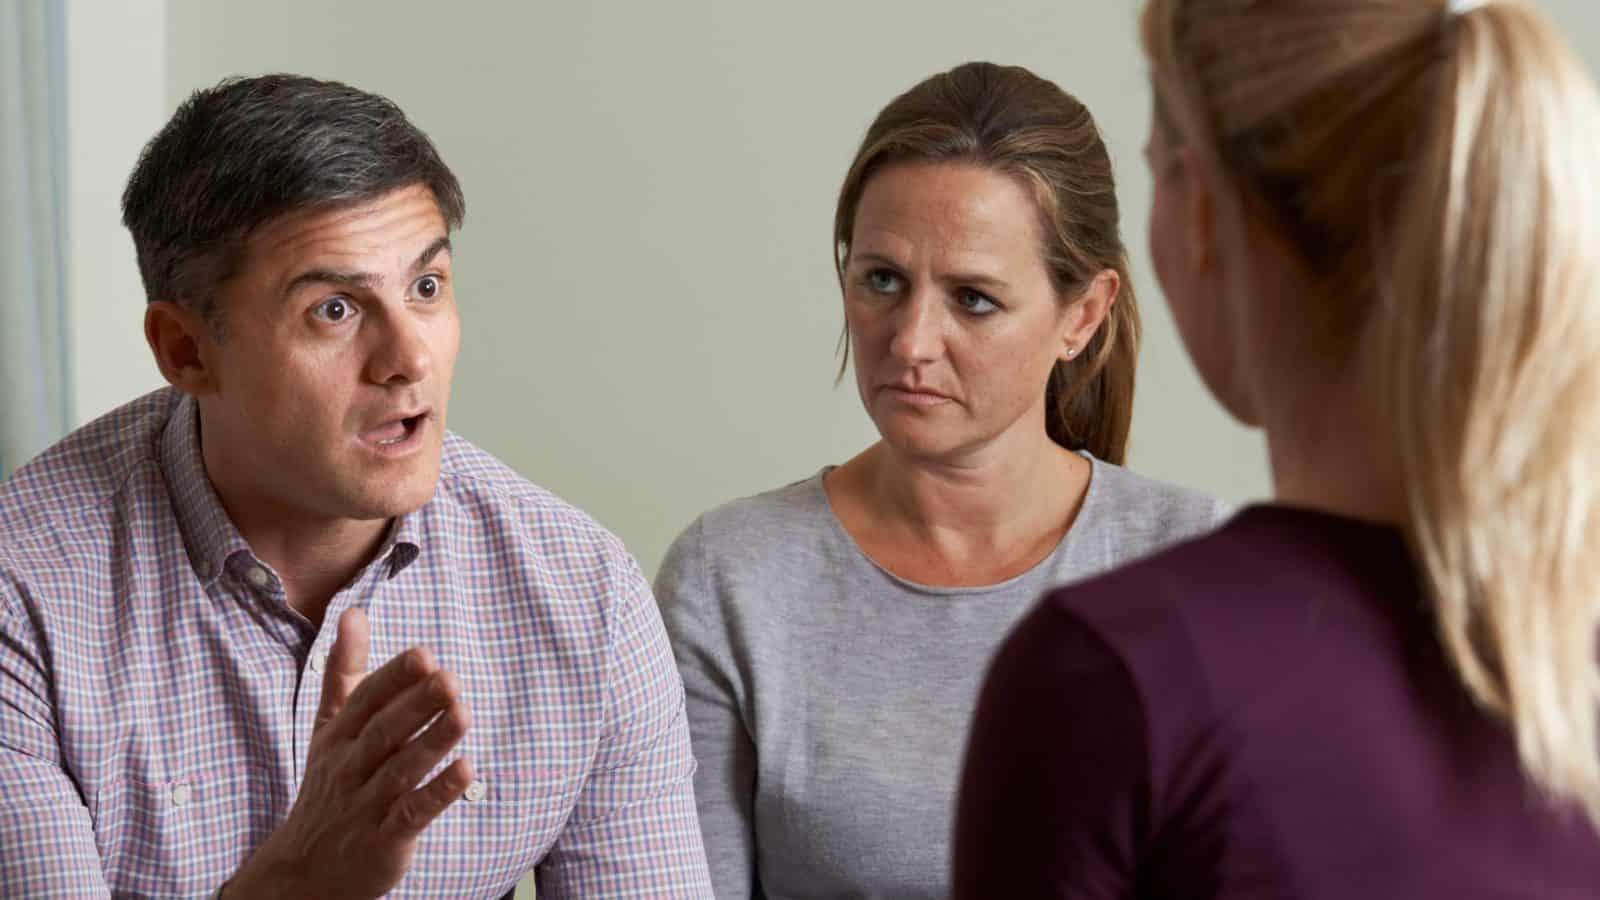 Facing Five Common Challenges that Affect Treatment Success